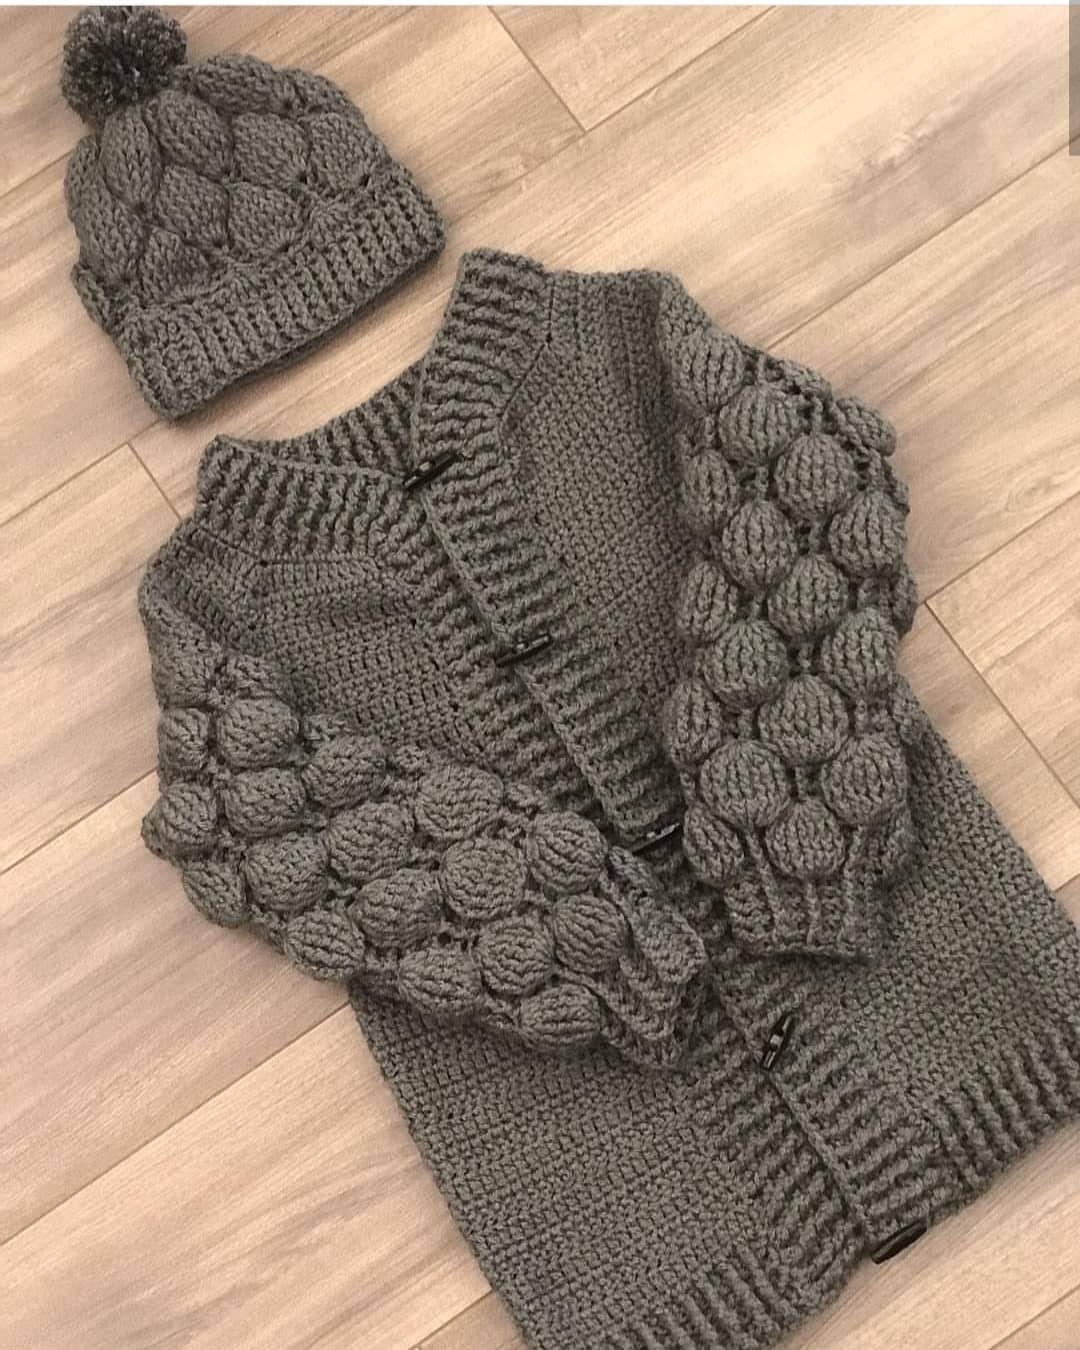 Otomatik alternatif metin yok. – Knitting world